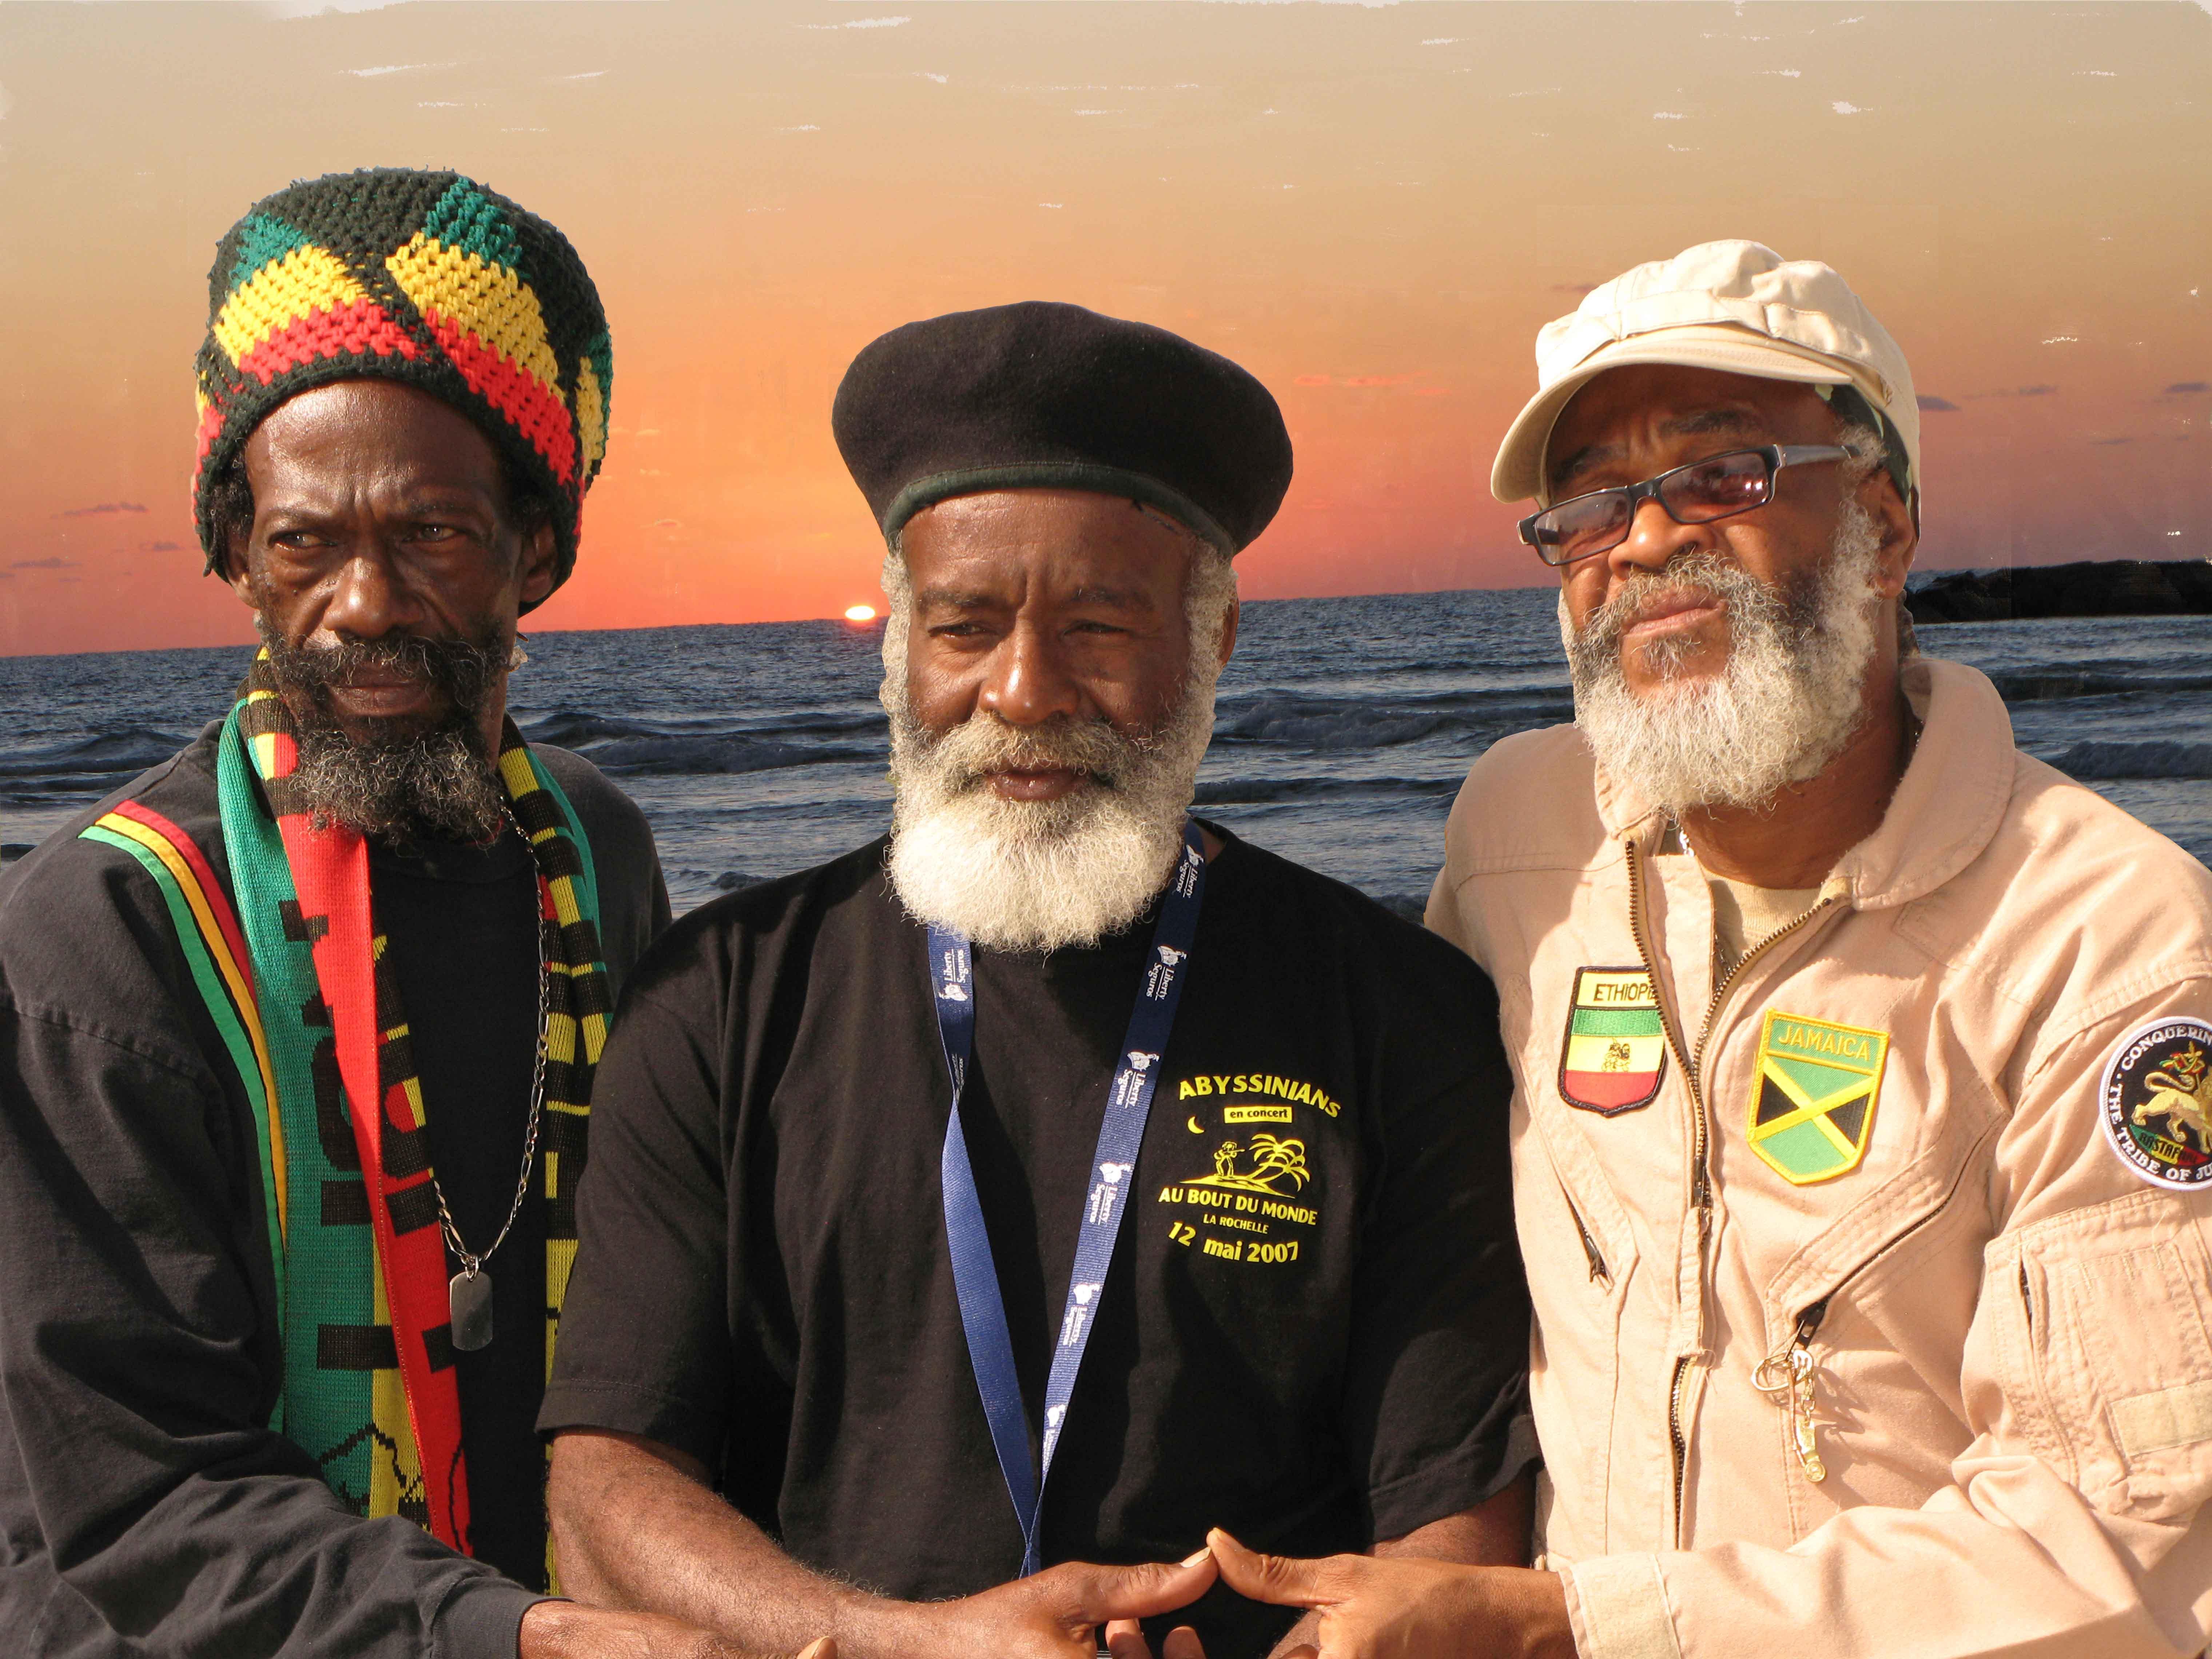 The Abyssinians il 28.08.19 al MIV